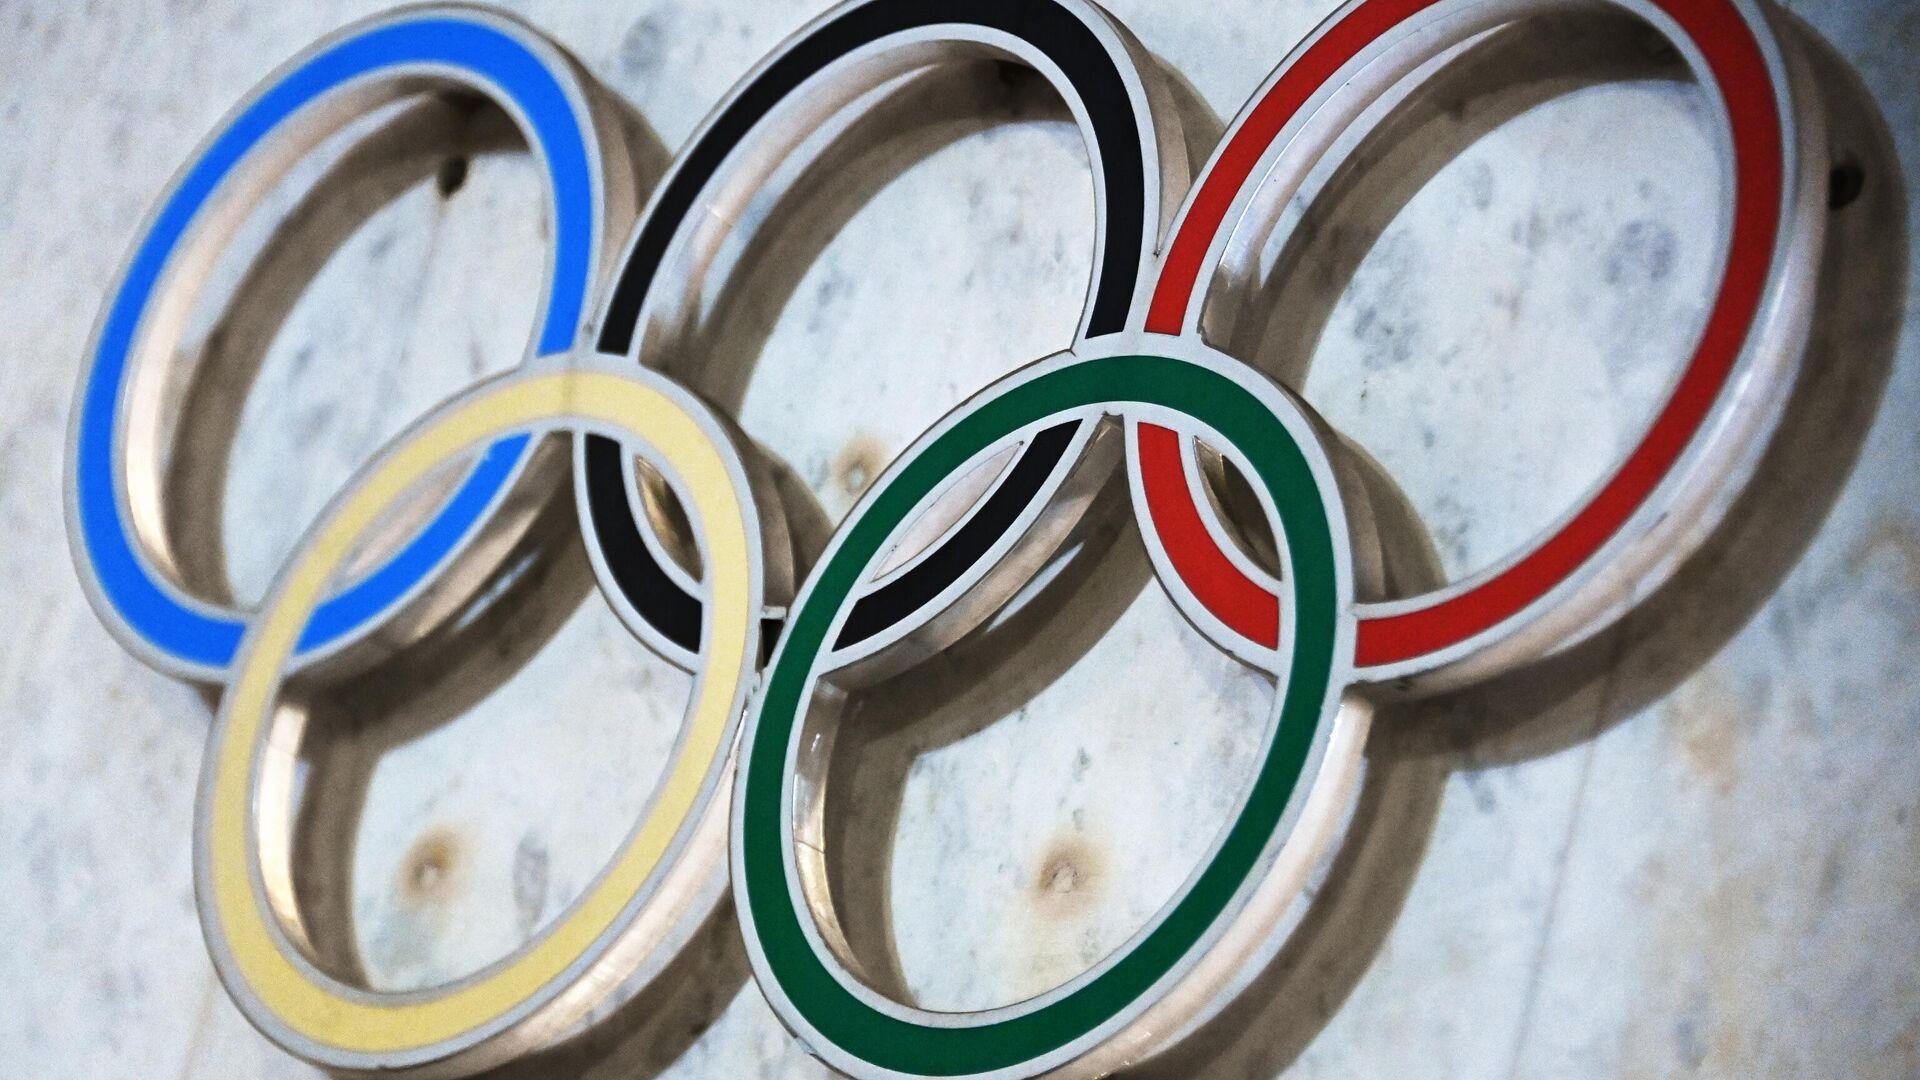 Olympische Ringe (Symbolbild) - SNA, 1920, 20.07.2021